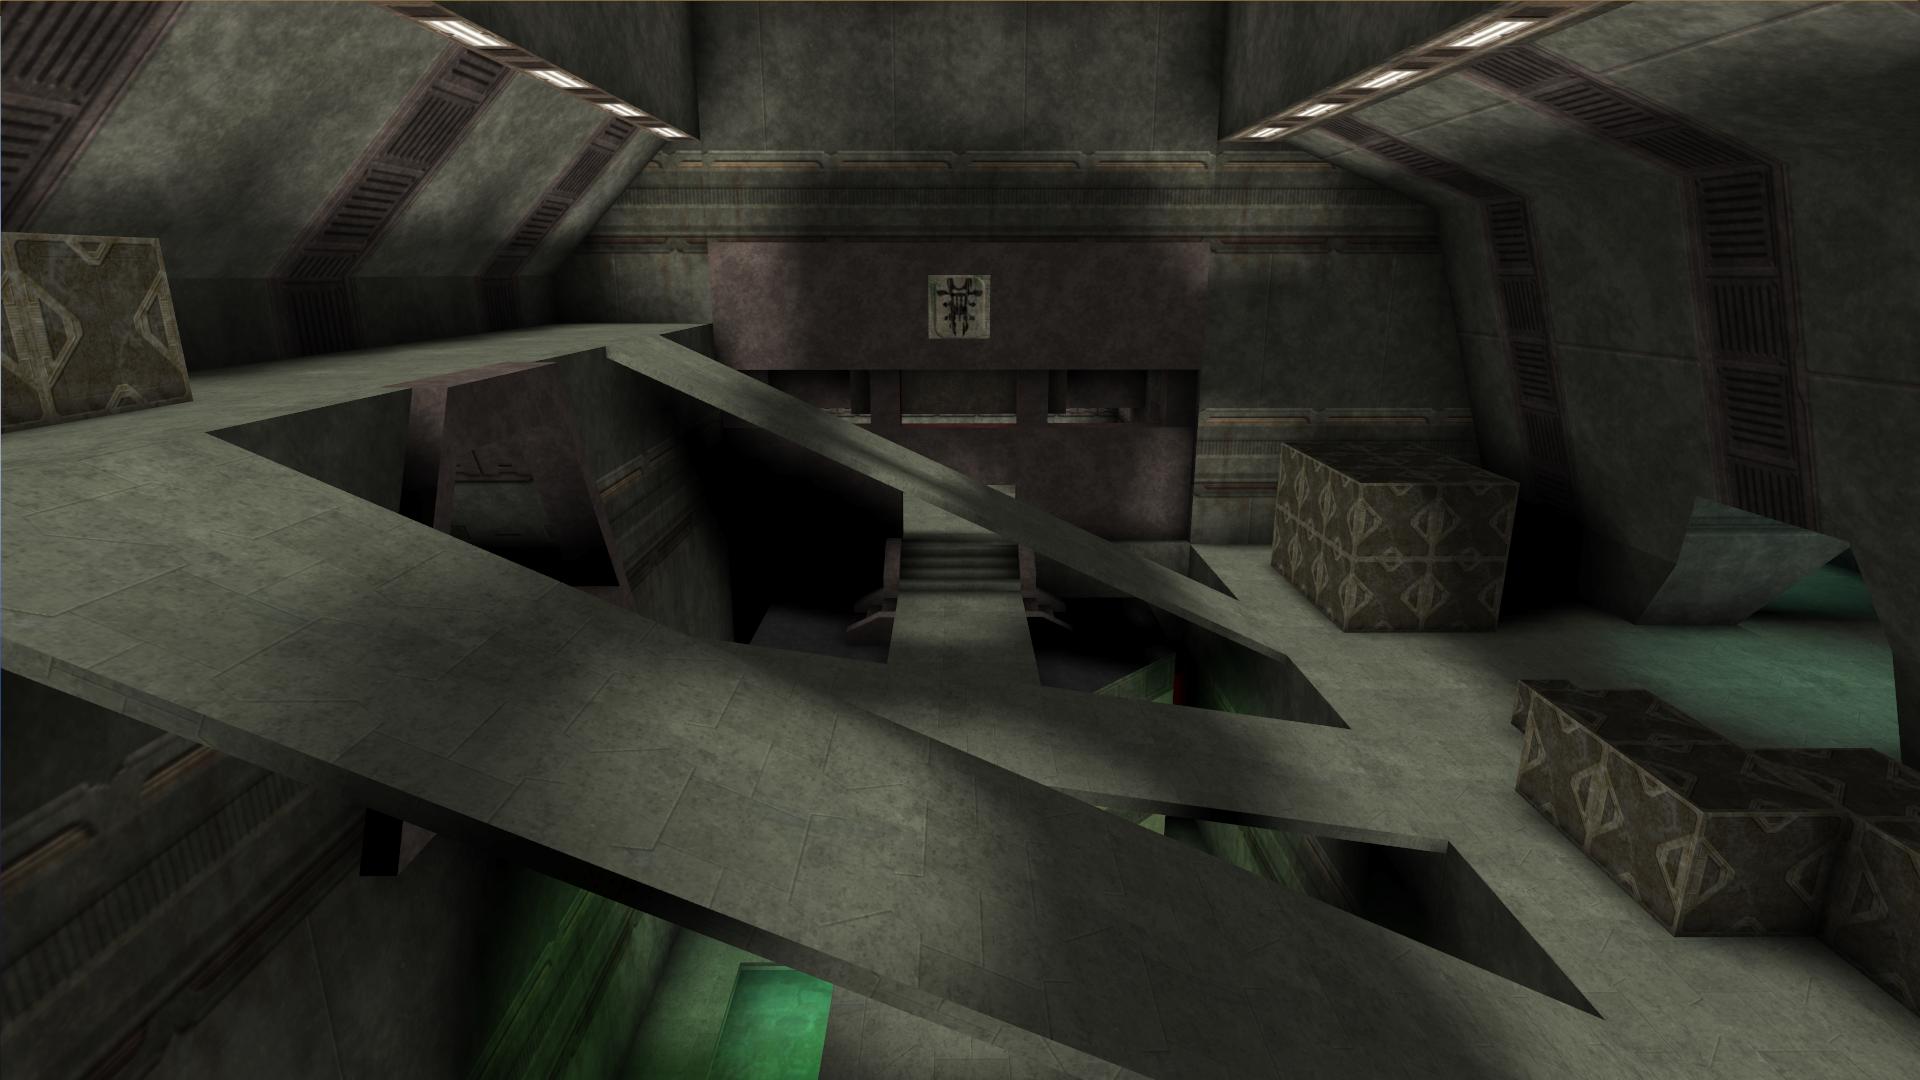 Deck. Эволюция.1. Unreal Tournament (1999)2. Unreal Tournament 2004 (2004)3. Unreal Tournament 3 (2007) - Изображение 1